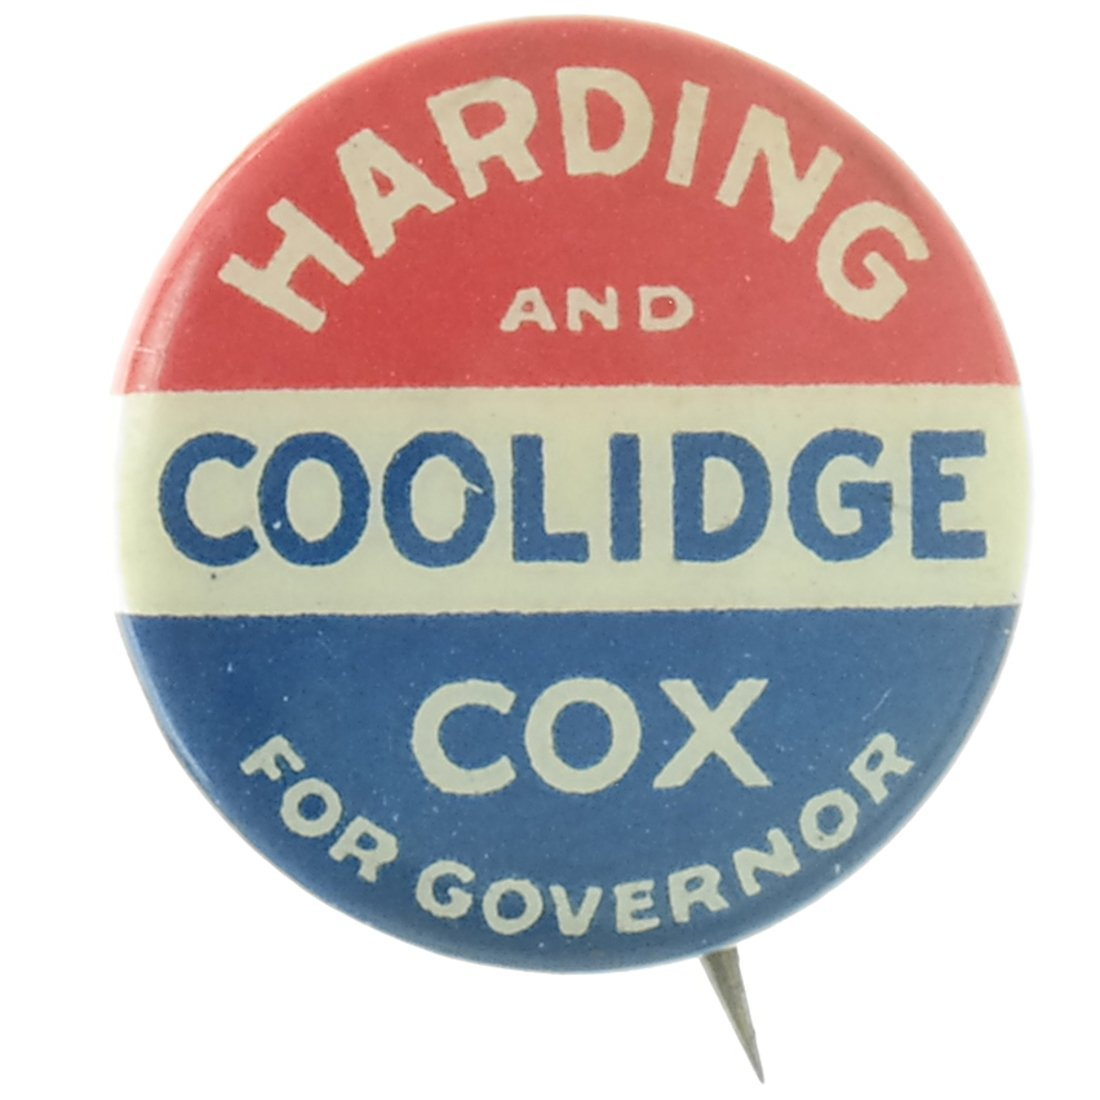 Harding & Coolidge - Three 1920 Celluloids - 3